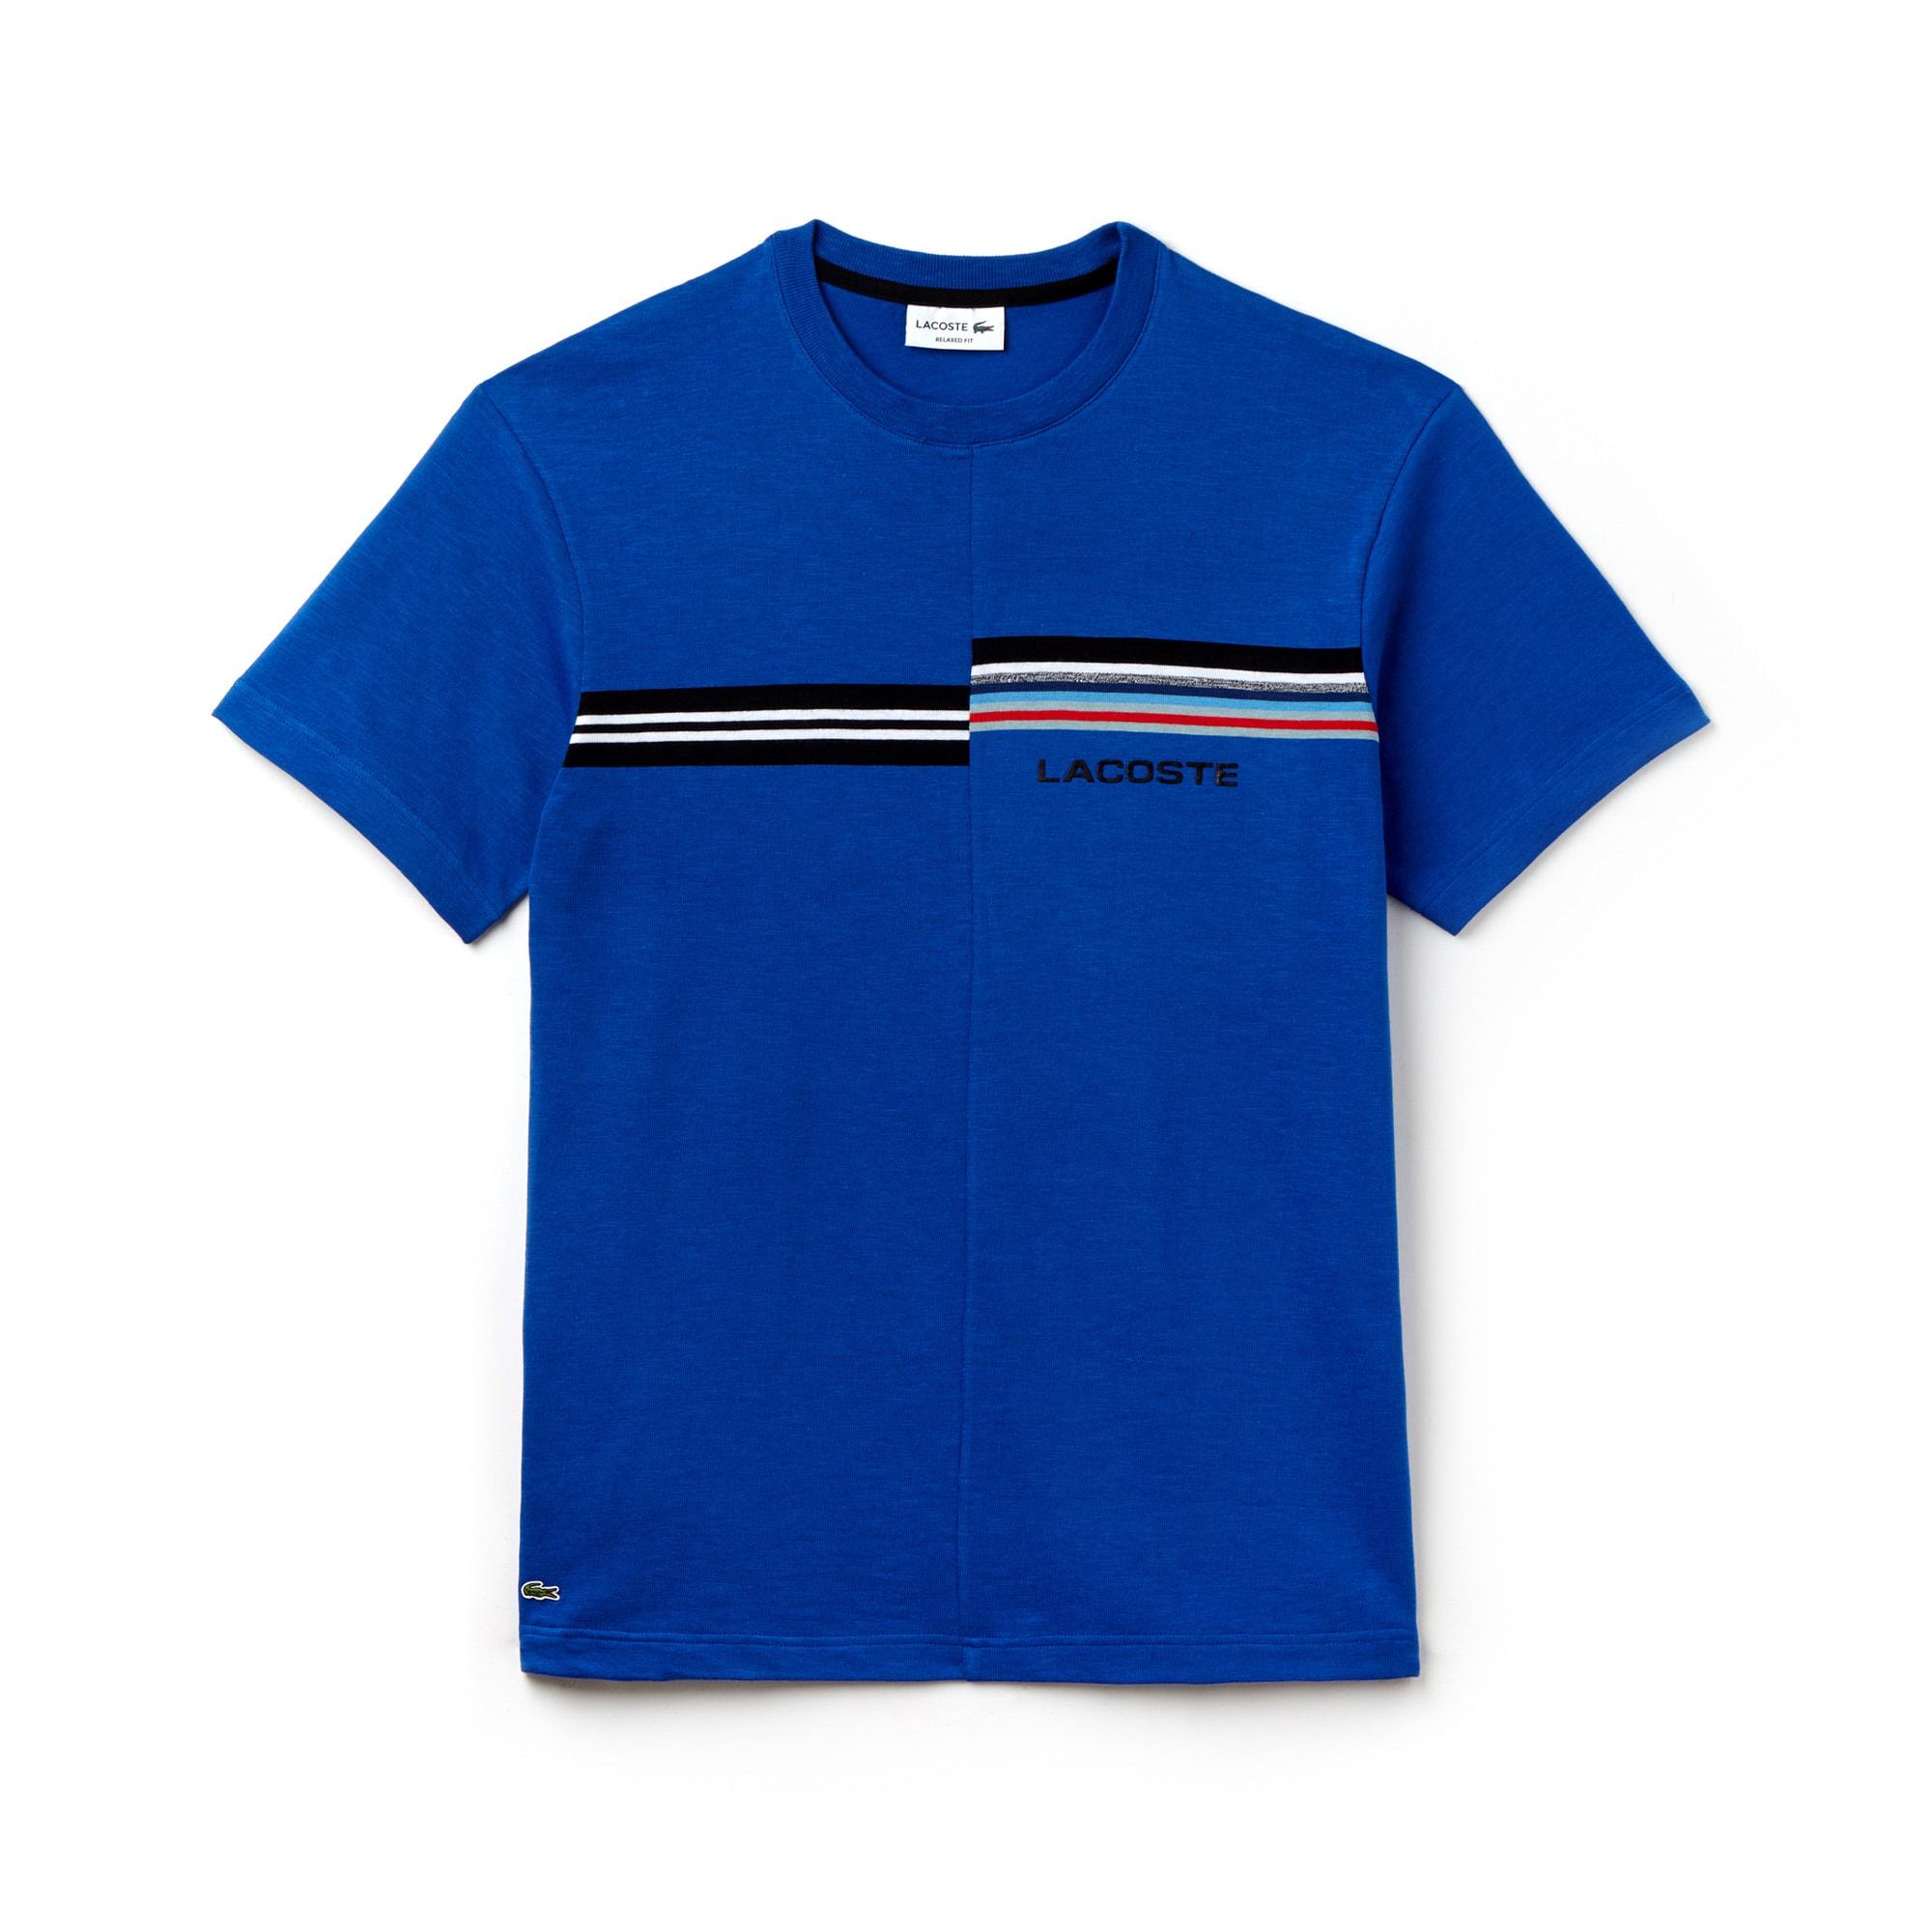 Men's 3D Lacoste Branding and Print Jersey Crew Neck T-shirt